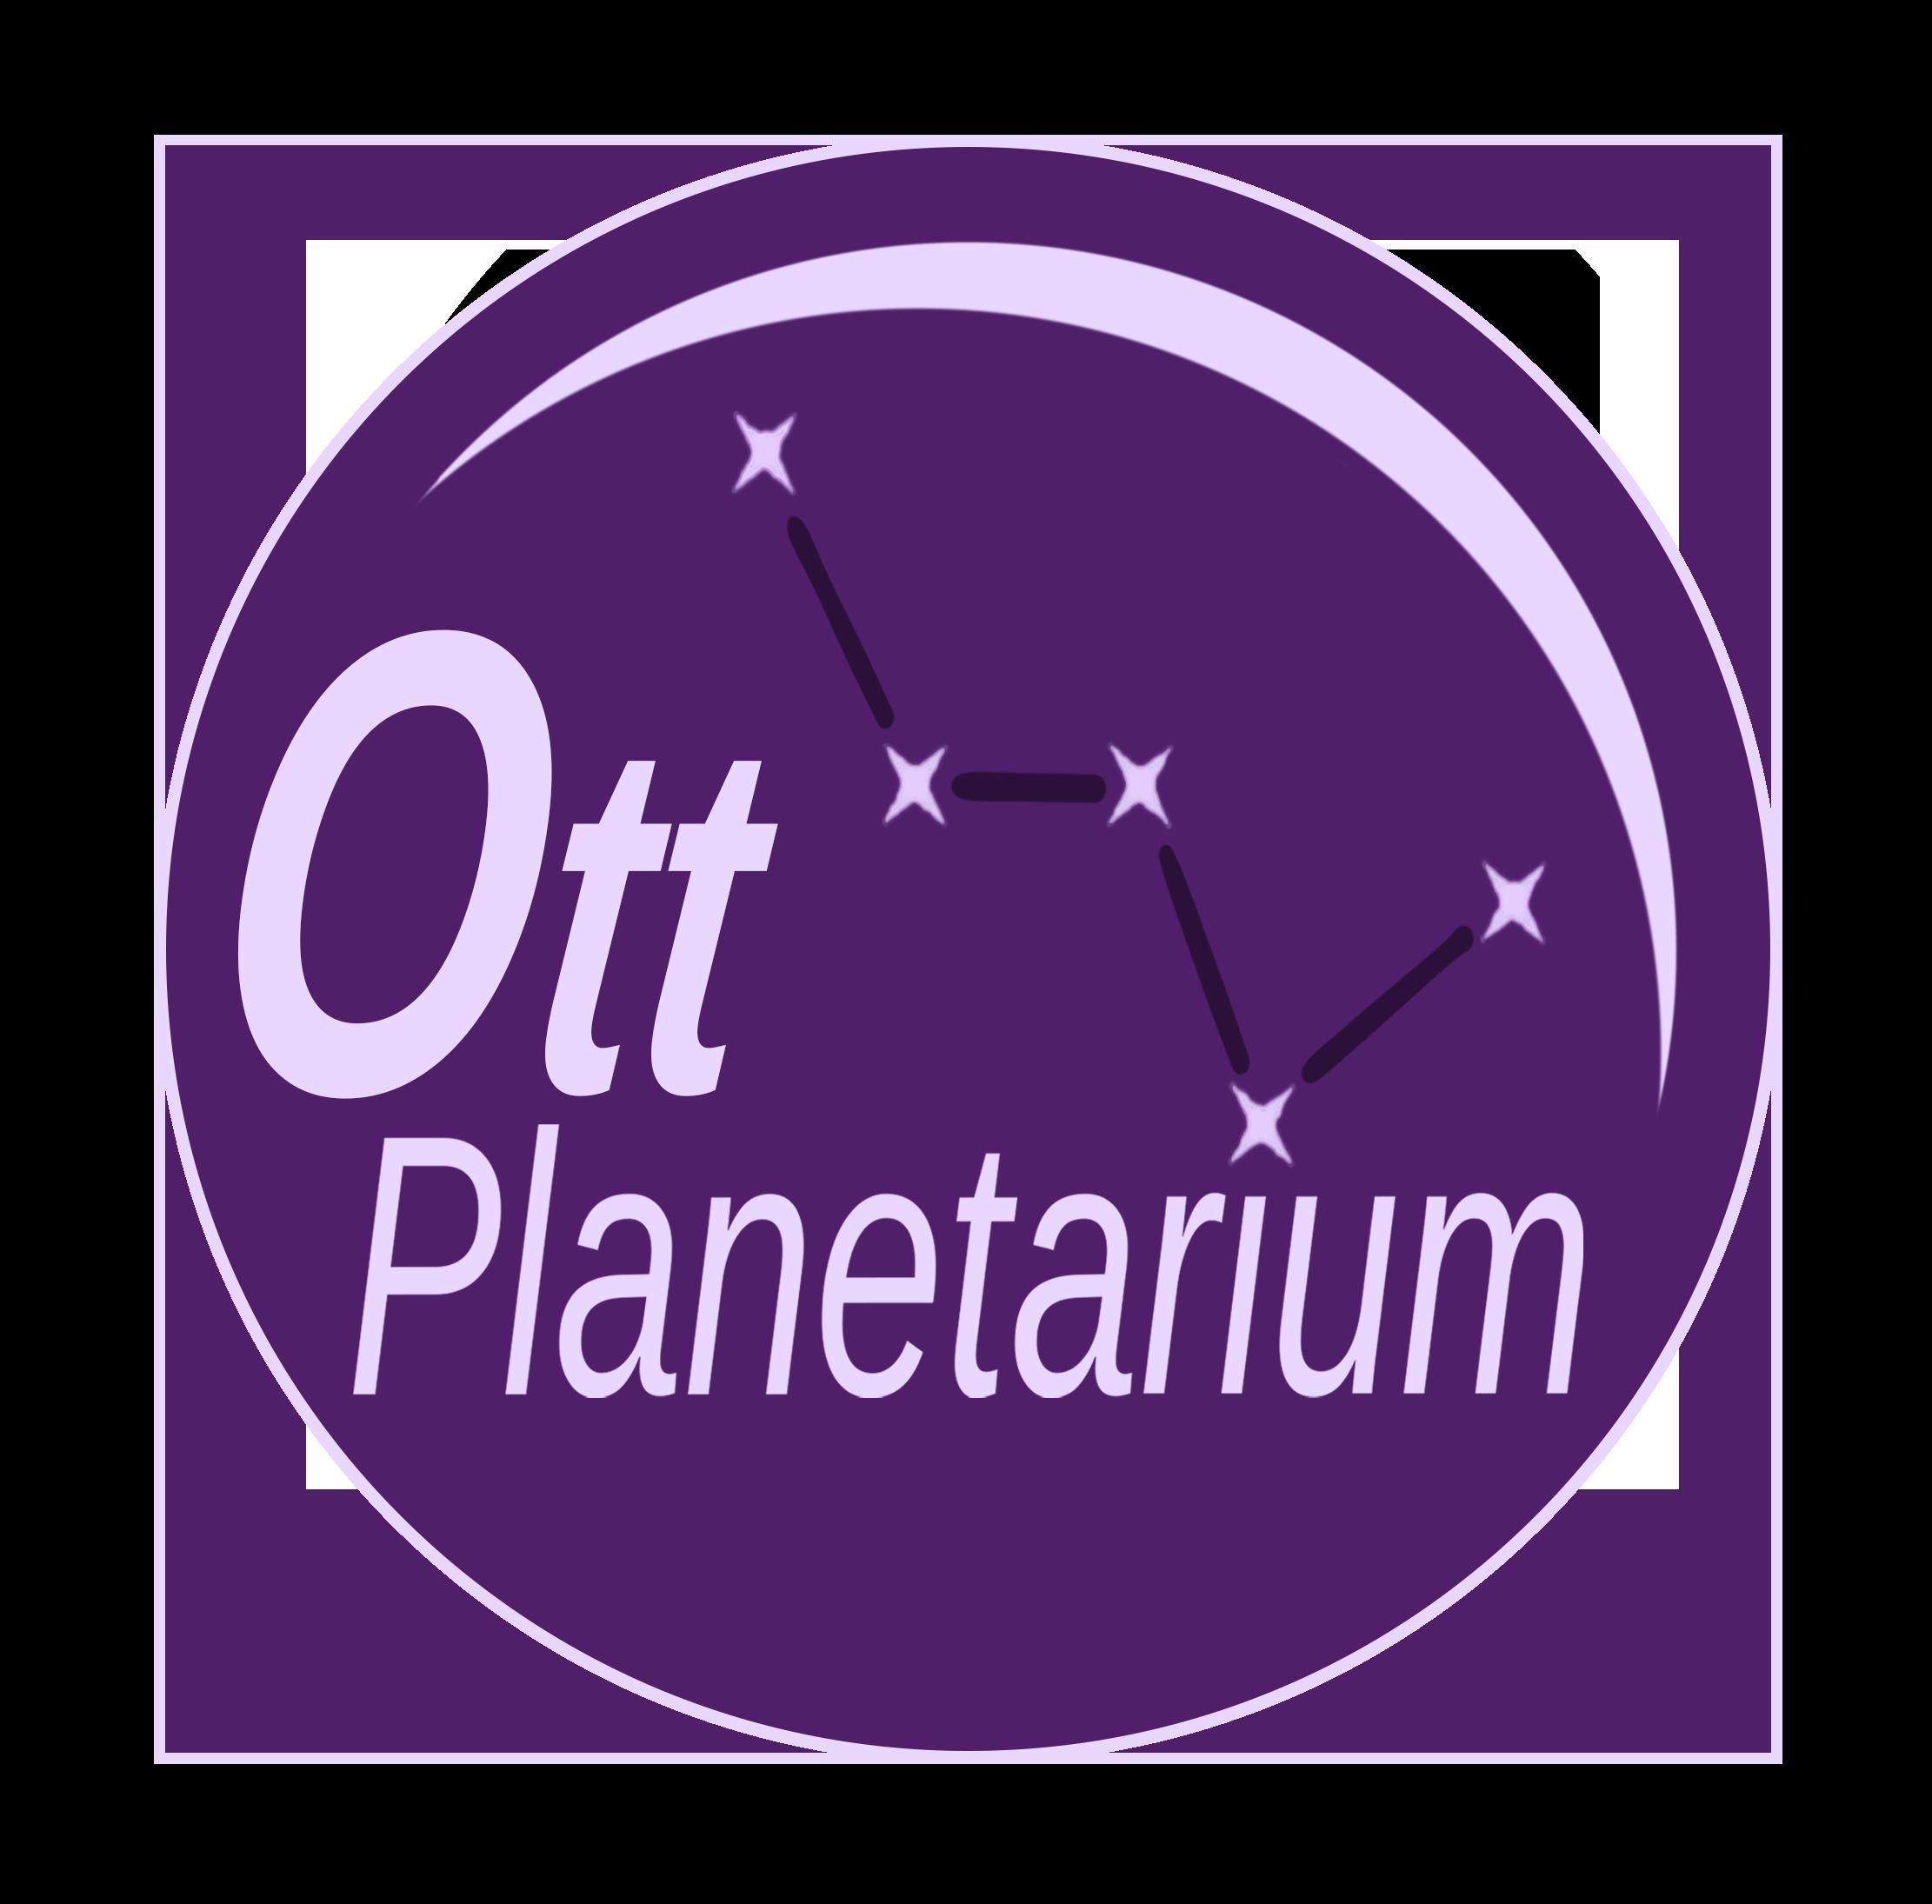 Weber State University: Ott Planetarium